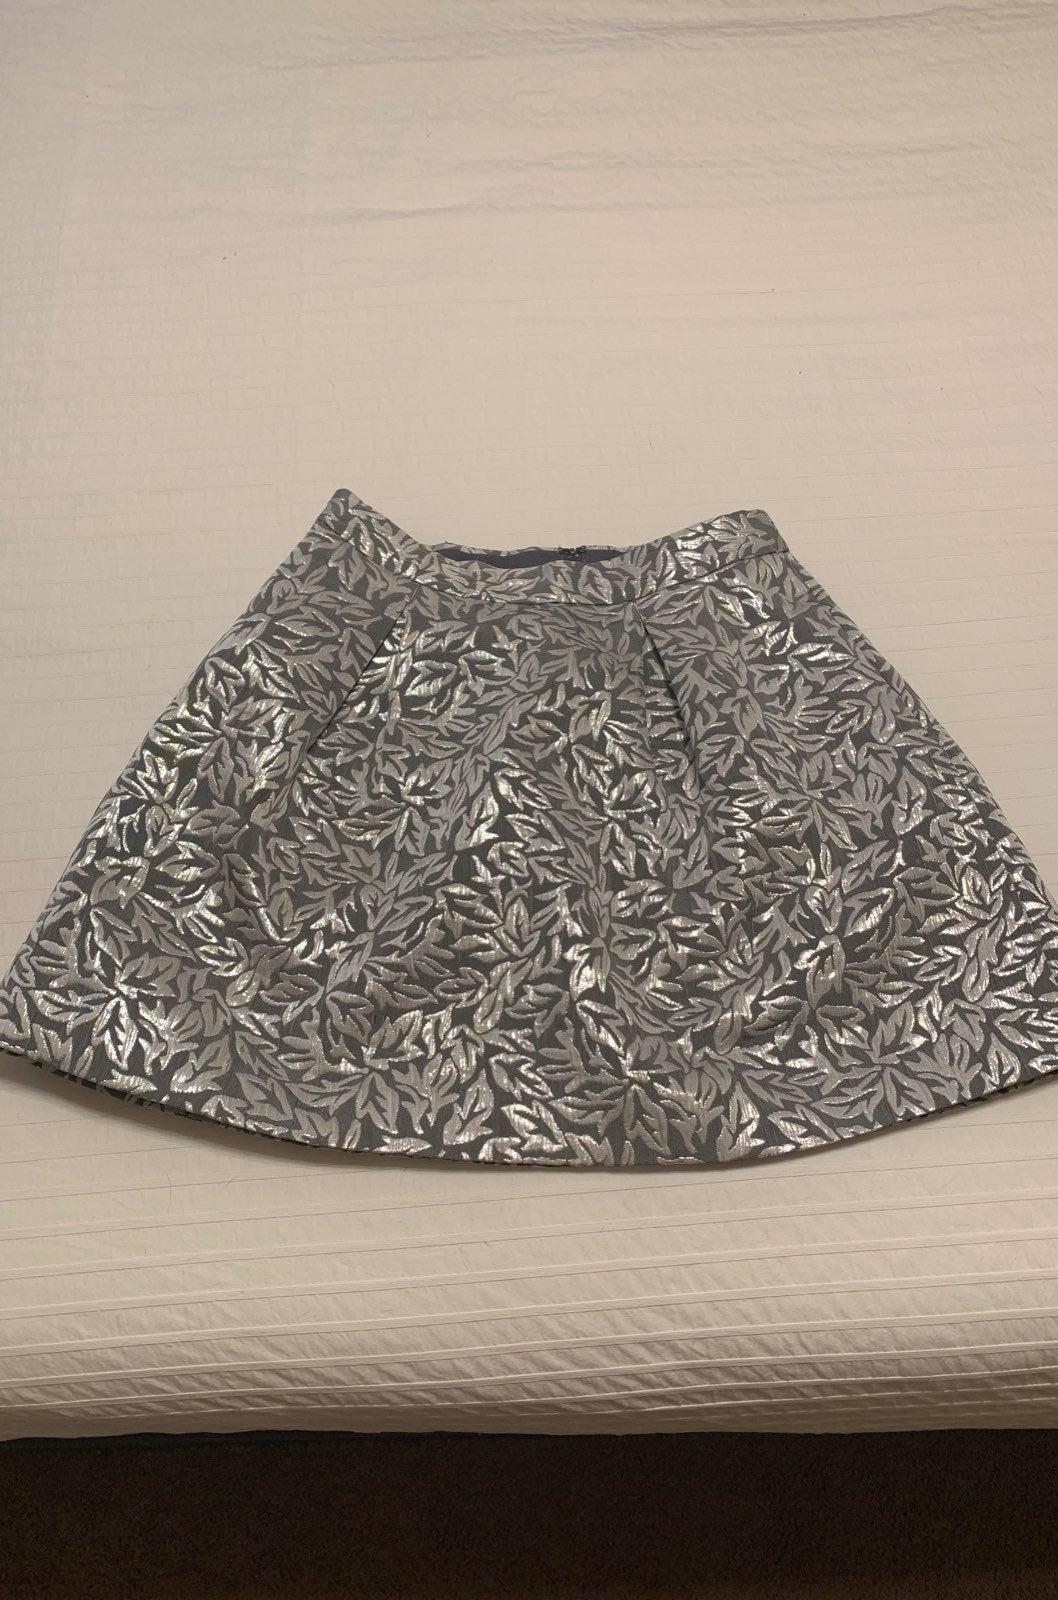 Behnaz Sarafpour Silver Skirt